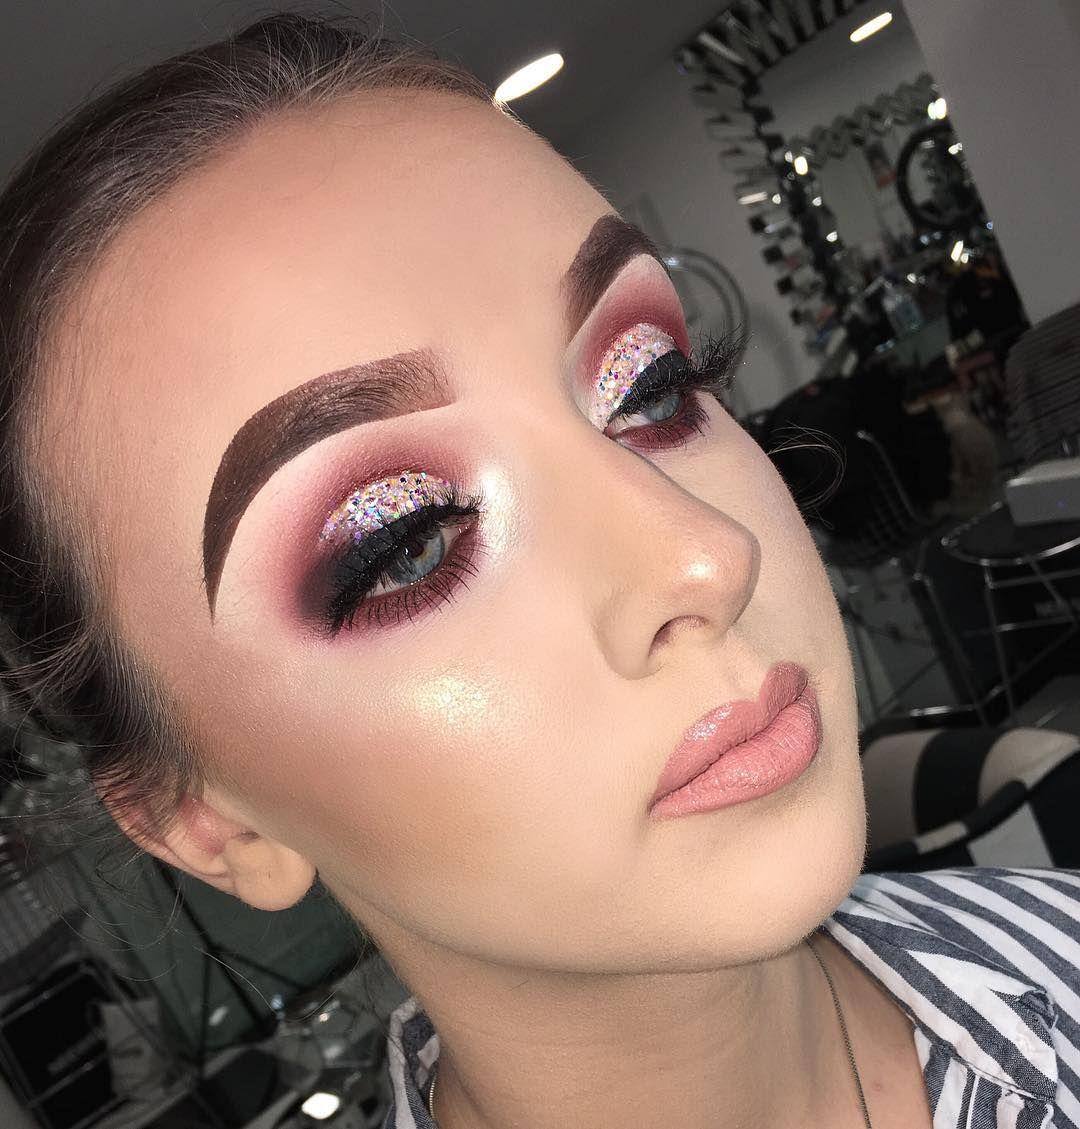 @tatti_lashes TL4 @anastasiabeverlyhills @nyxcosmetics warm neutrals @magpie_beauty Glitter in Crystal @mirellecosmetics Angela's Angel @jouercosmetics Skinny Dip Gloss